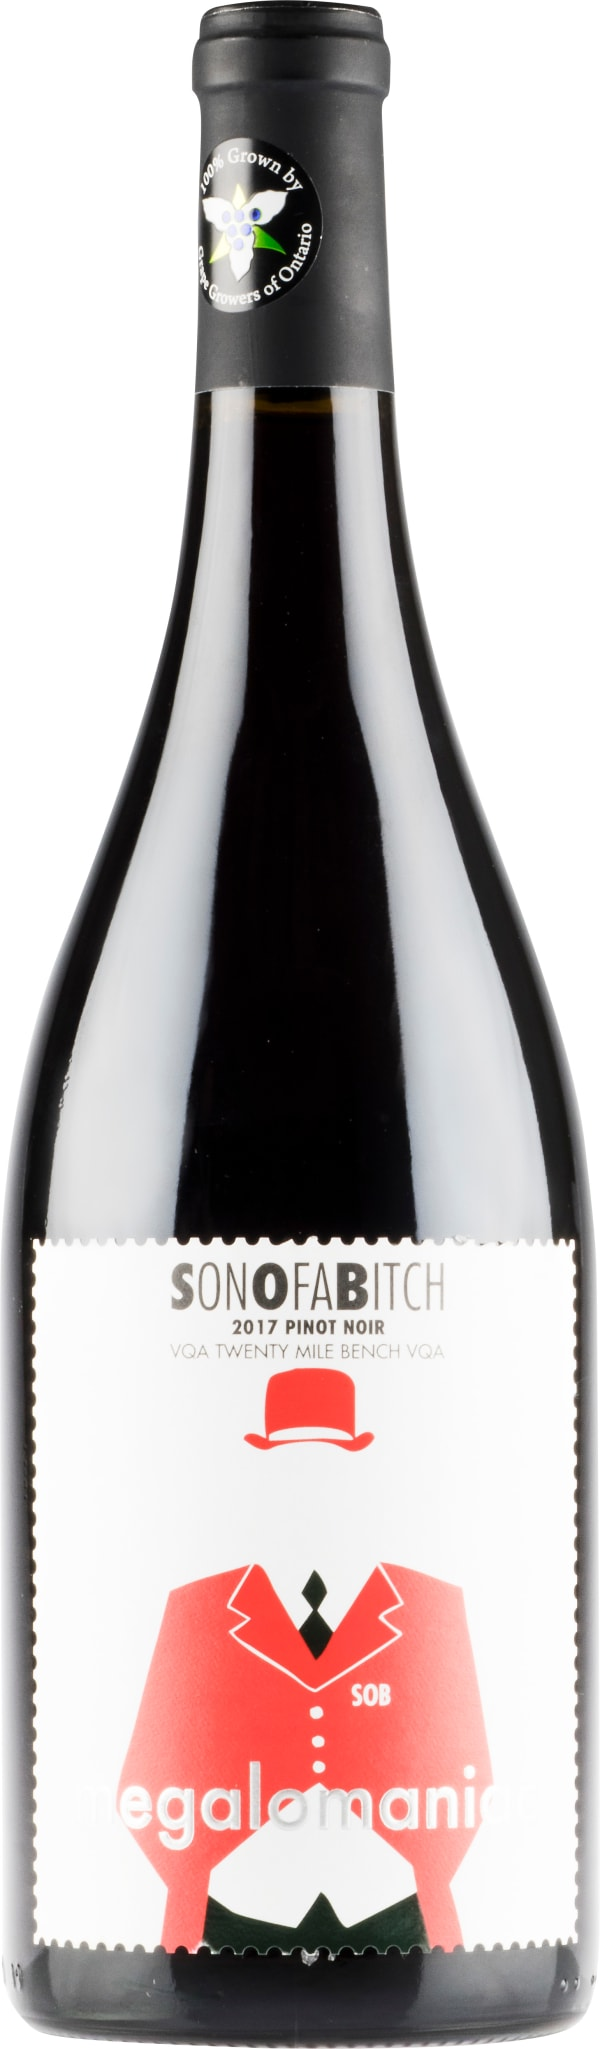 Megalomaniac Sonofabitch Pinot Noir 2017